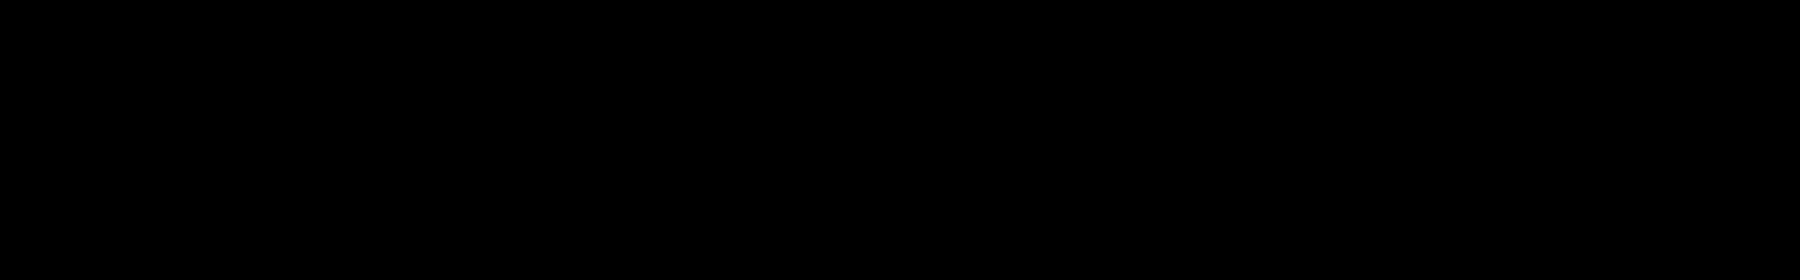 Xenon audio waveform